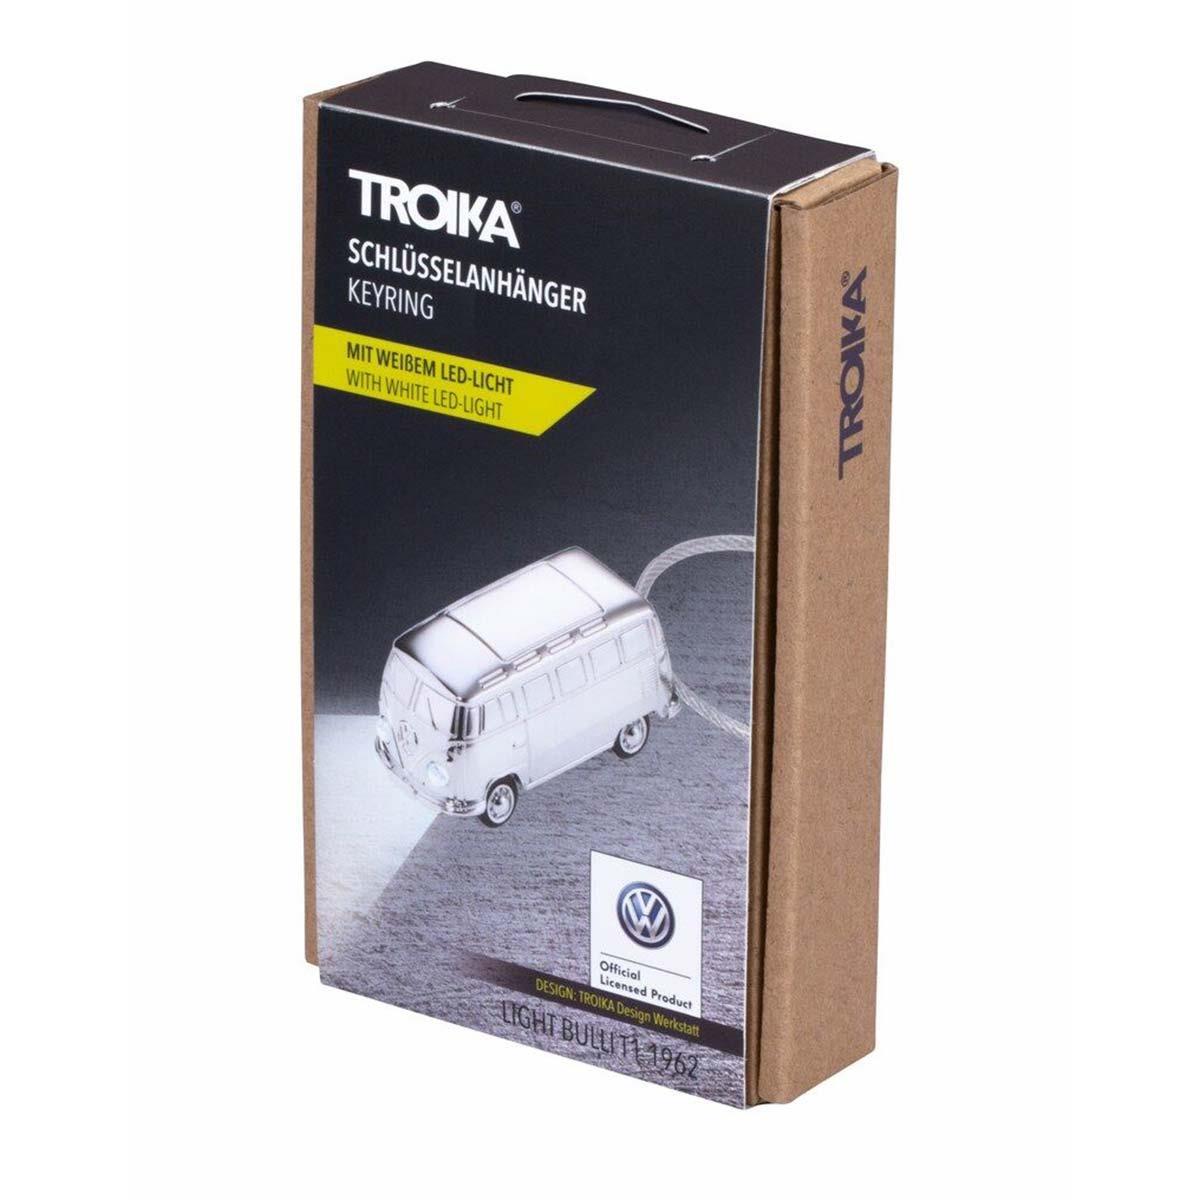 Troika μπρελόκ φορτηγάκι T1 VW με led